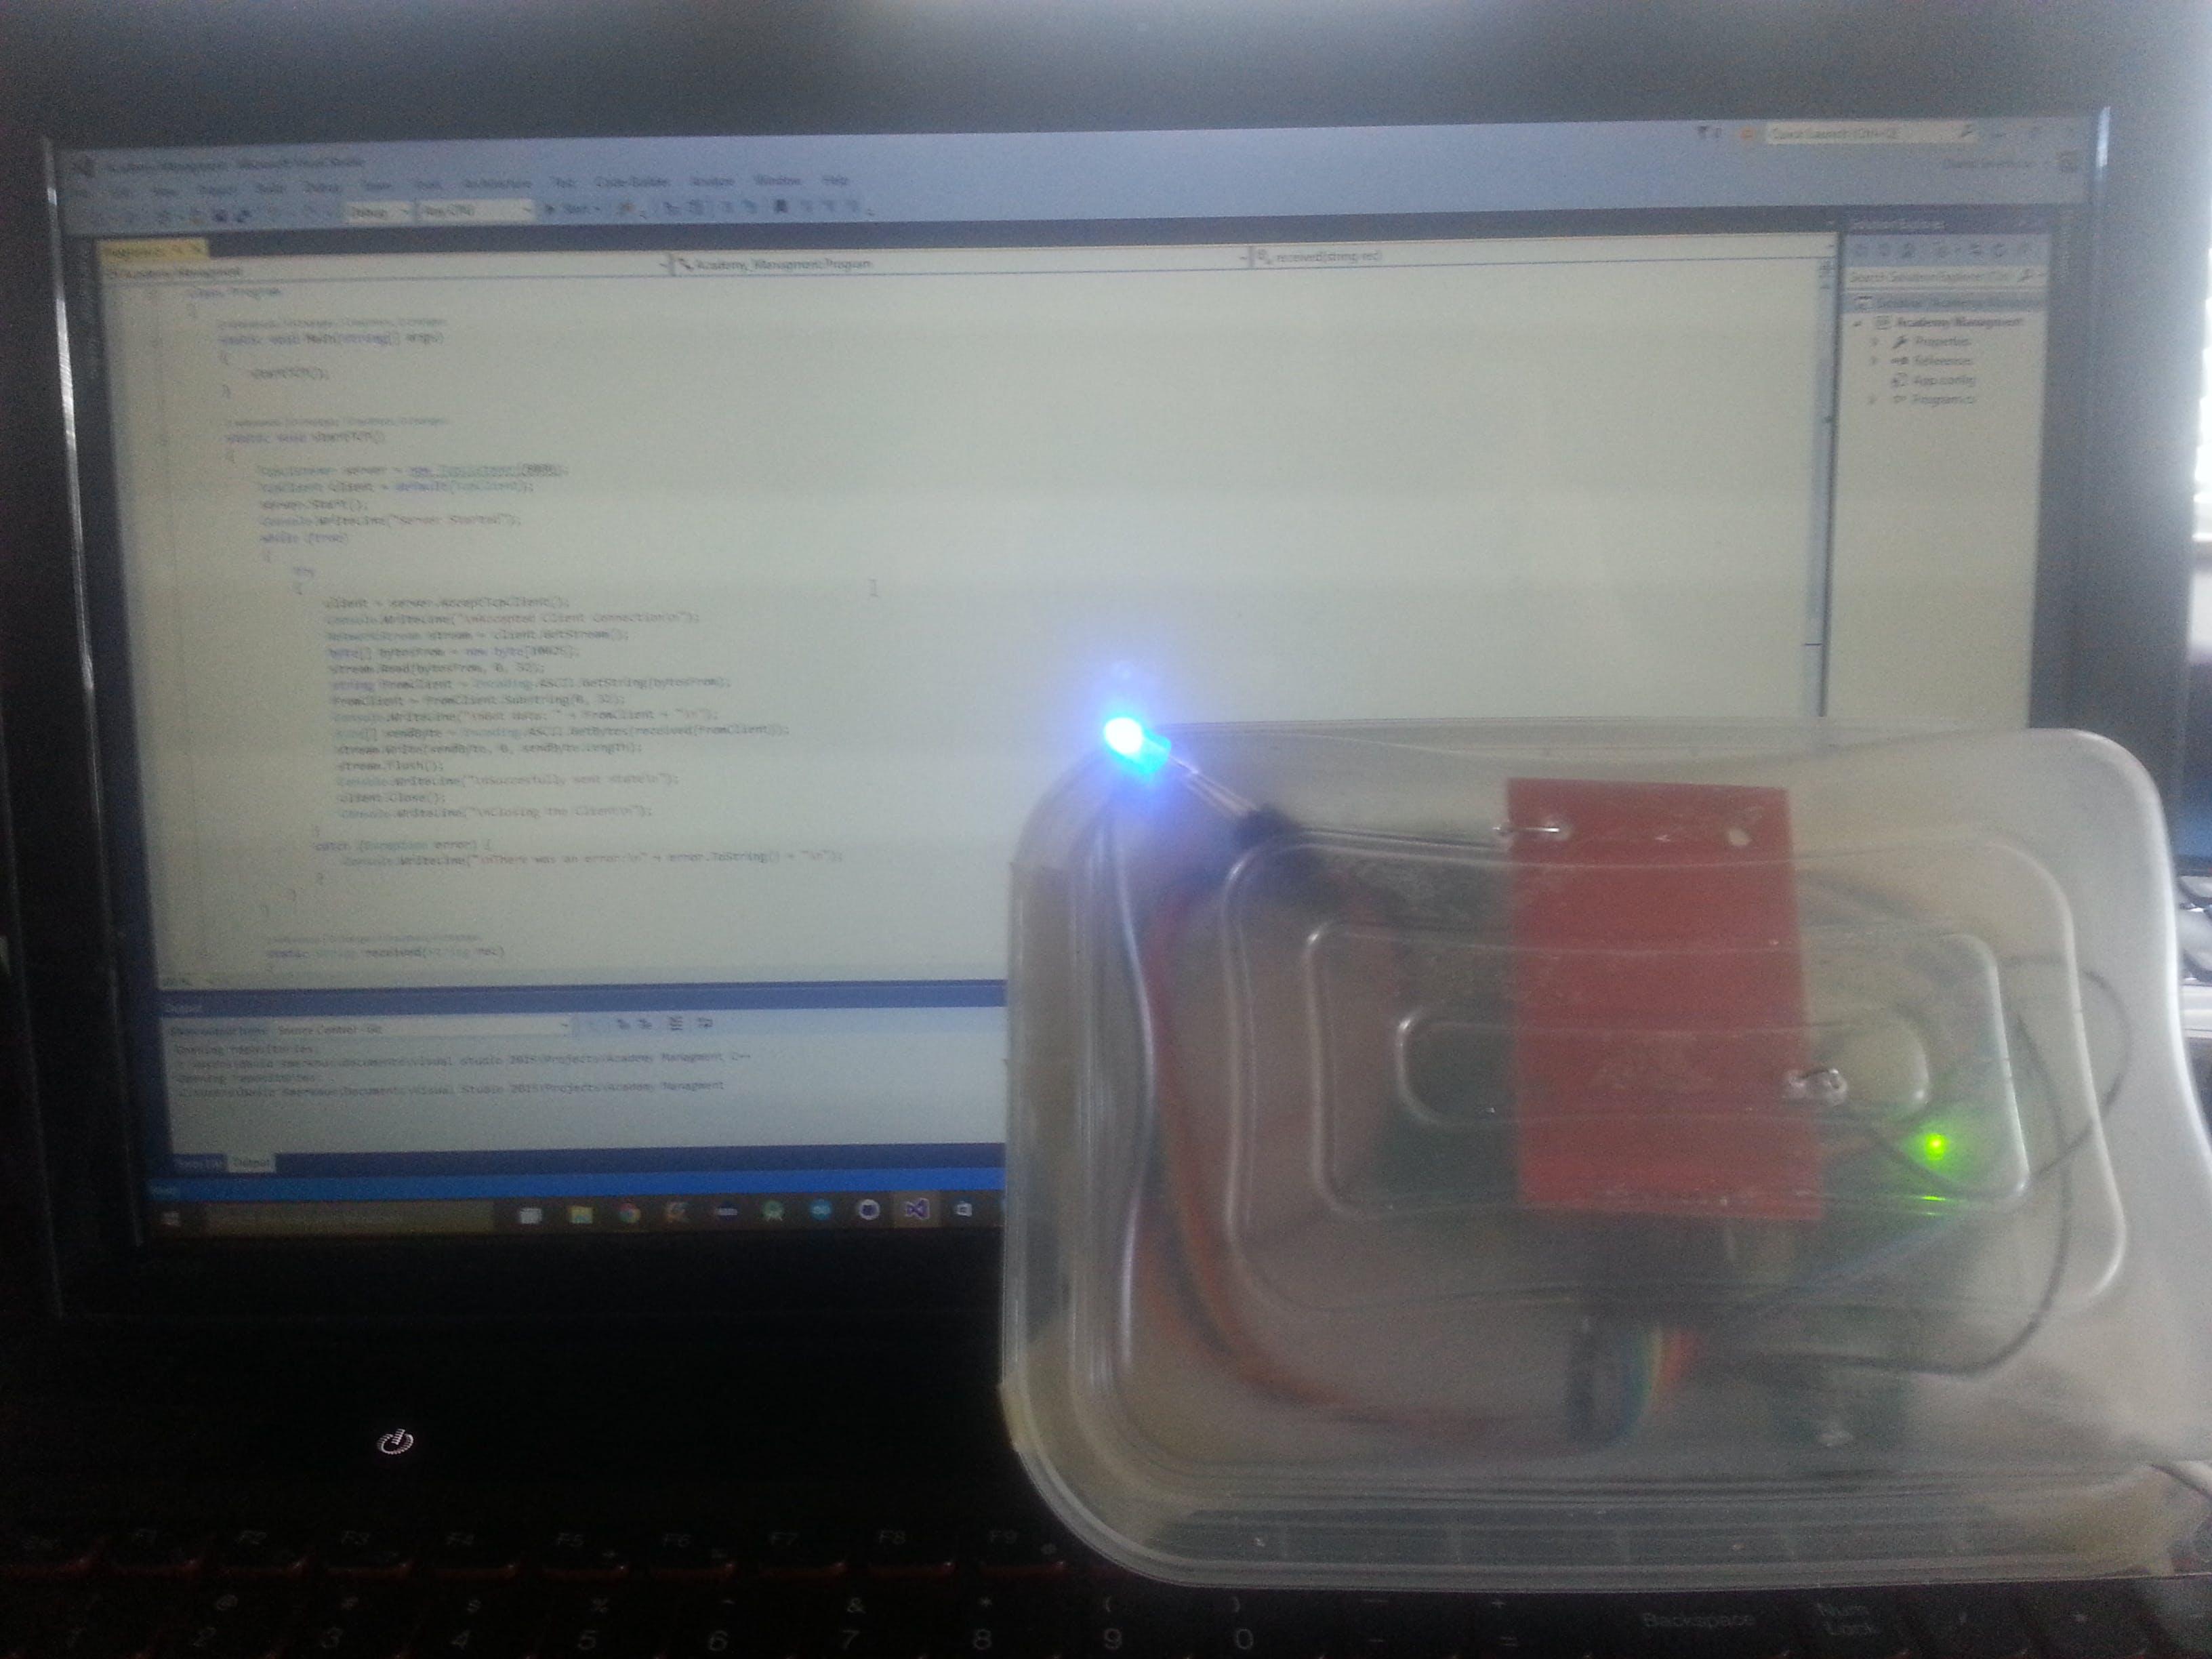 Linkit One Wireless RFID reader